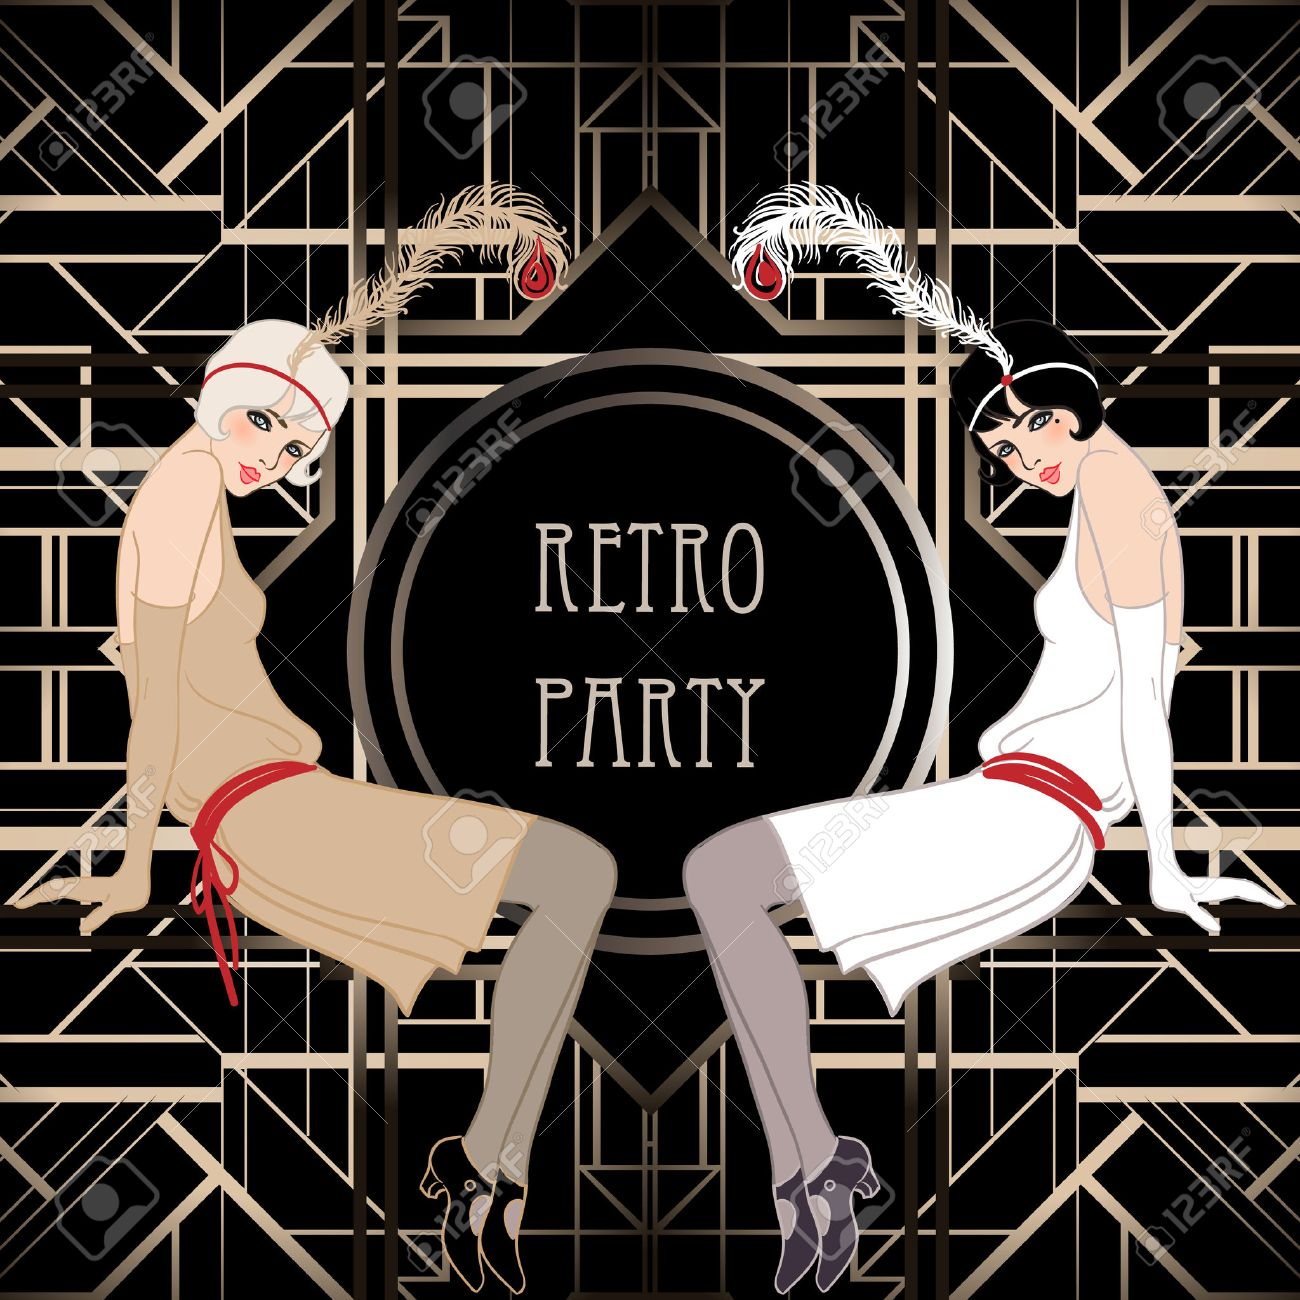 Flapper girl retro party invitation design vector illustration flapper girl retro party invitation design vector illustration great gatsby style stock stopboris Image collections